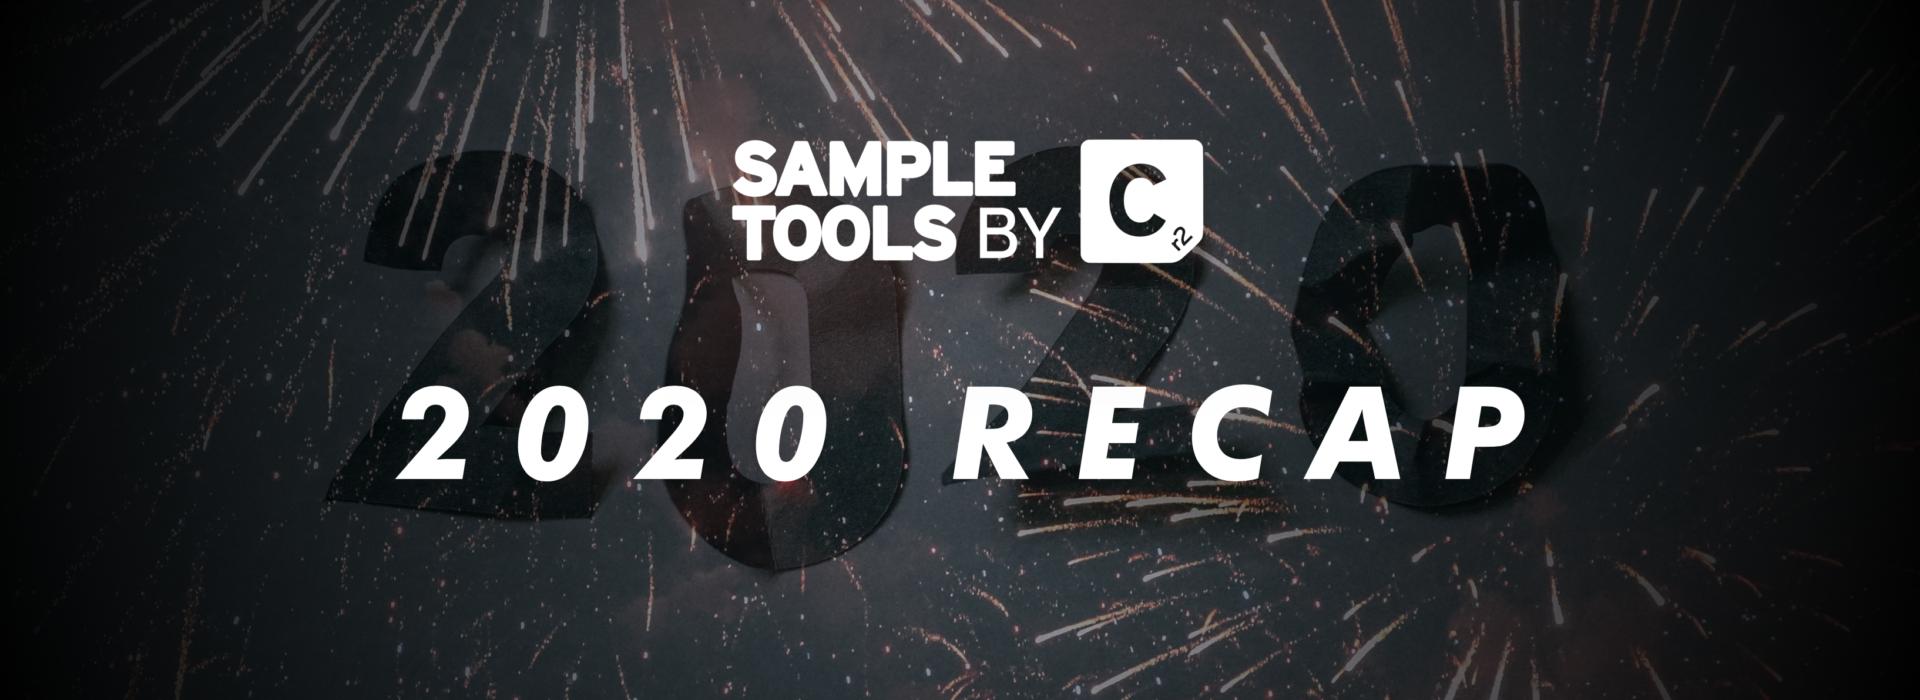 Sample Tools by Cr2 – 2020 Recap